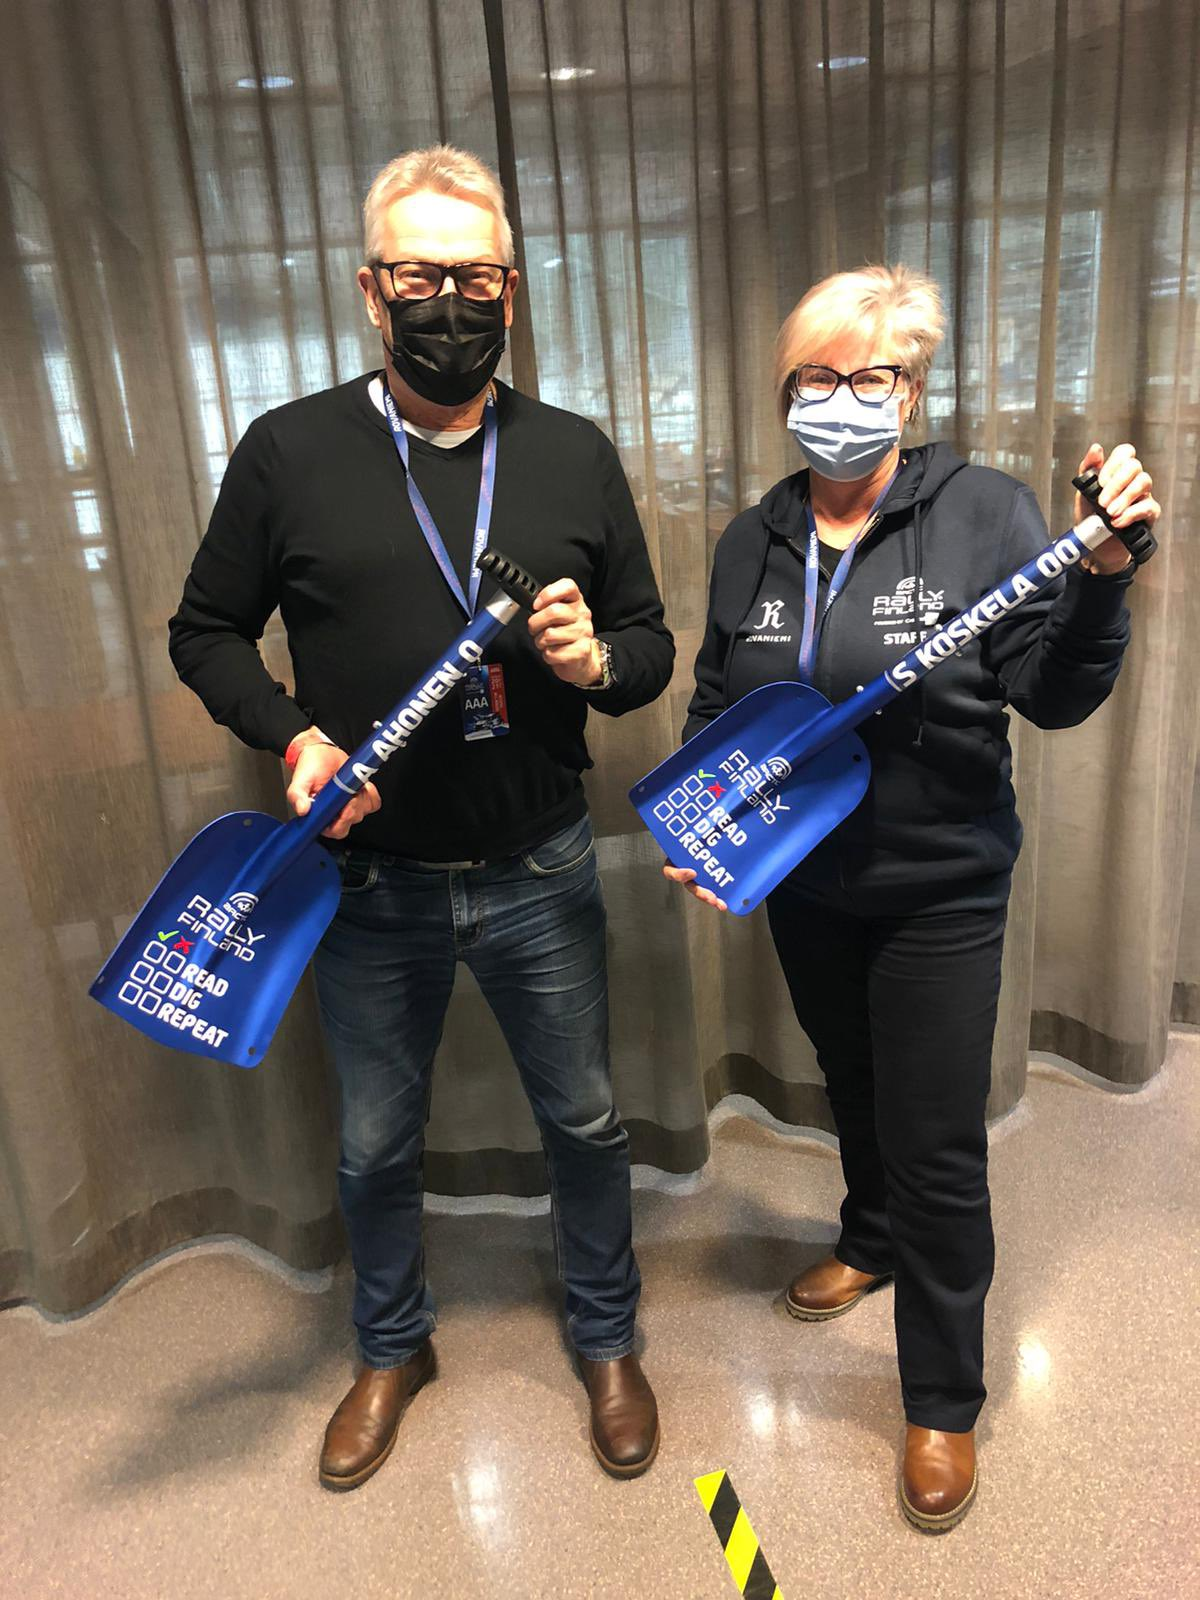 WRC: Arctic Rally Finland - Powered by CapitalBox [26-28 Febrero] - Página 2 EvAW6x6XMAsKpeu?format=jpg&name=large